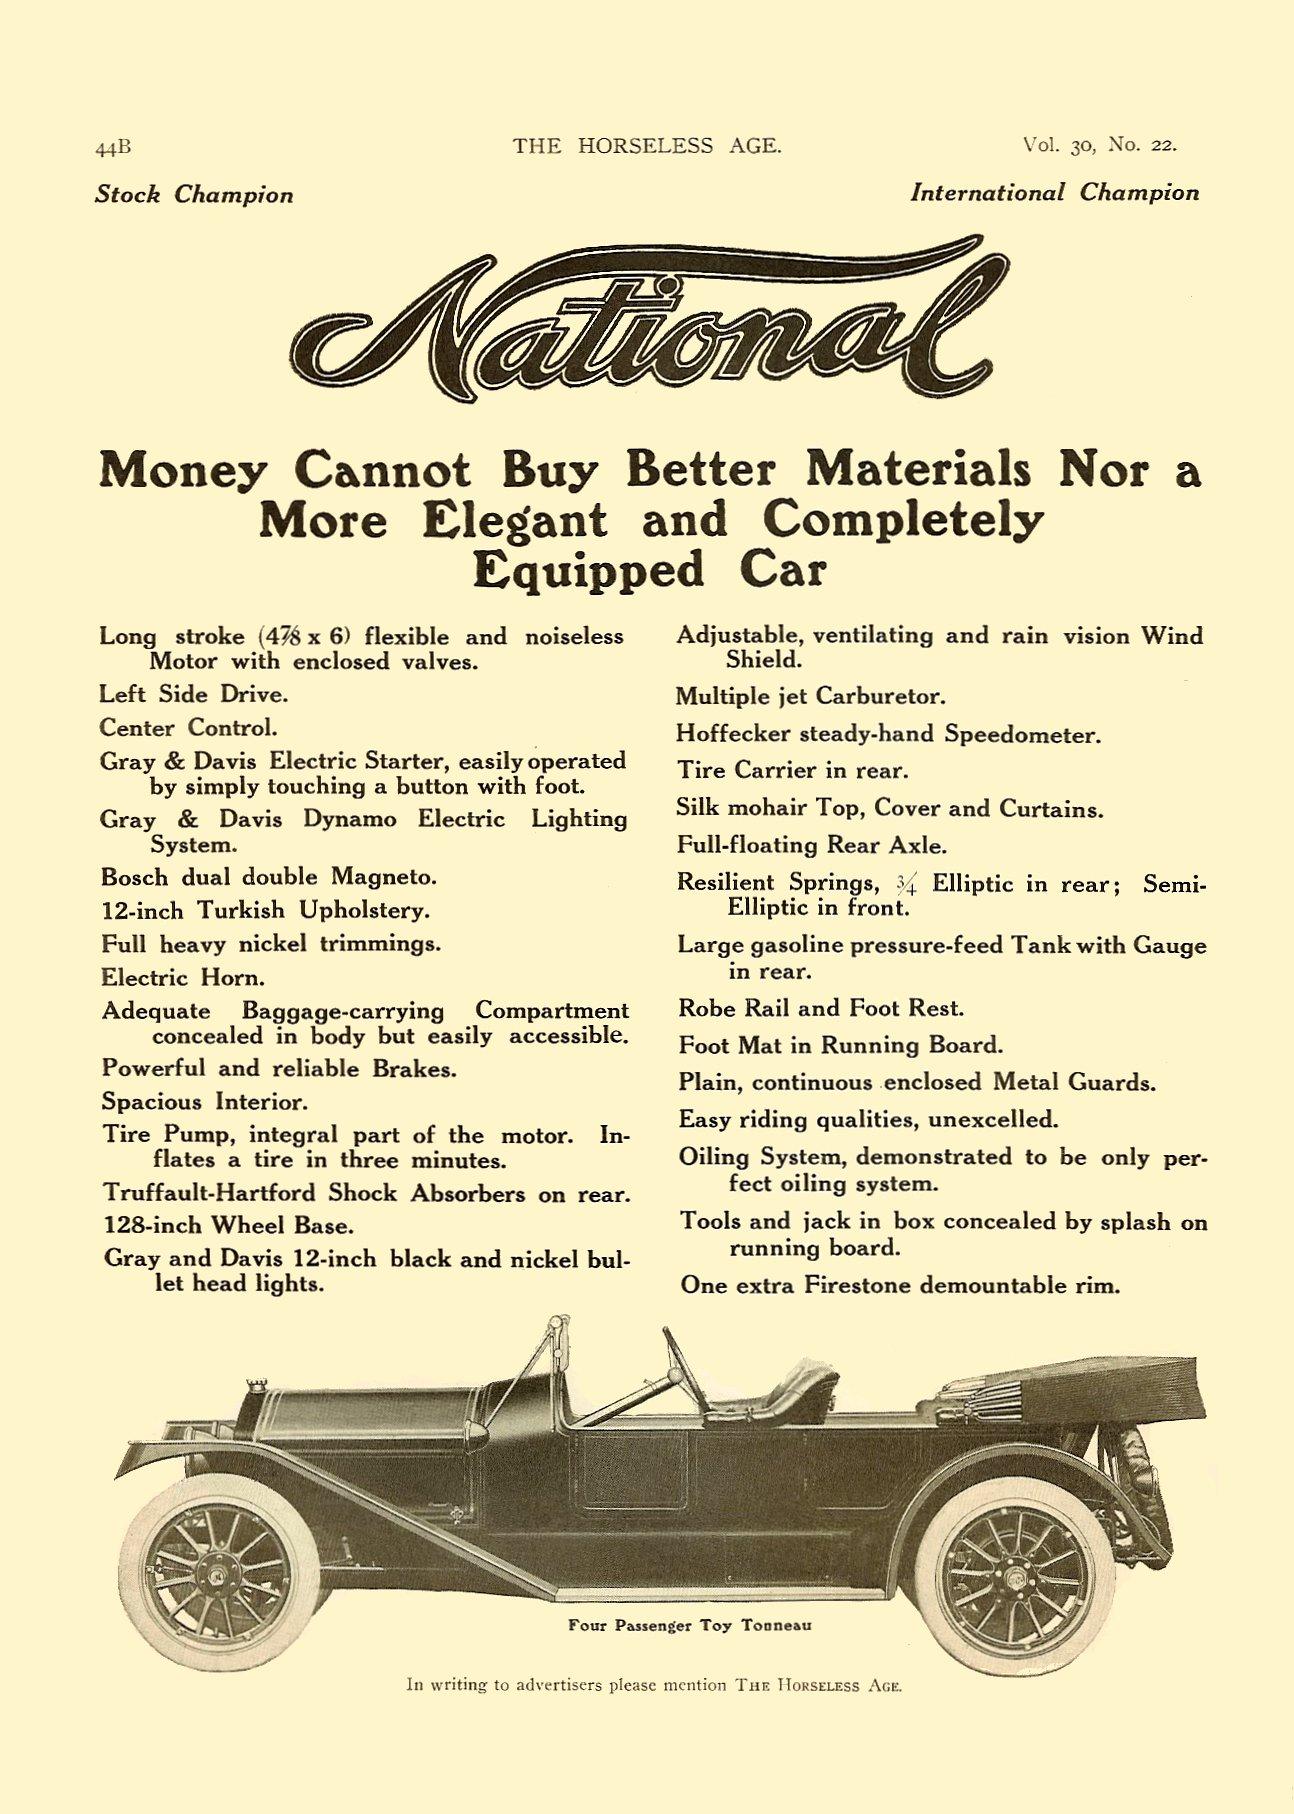 1913 11 27 NATIONAL Improved Series V Fives Models – $2750 to $3400 THE HORSELESS AGE Vol. 30, No. 22 November 27, 1912 9″x12″ page 44B